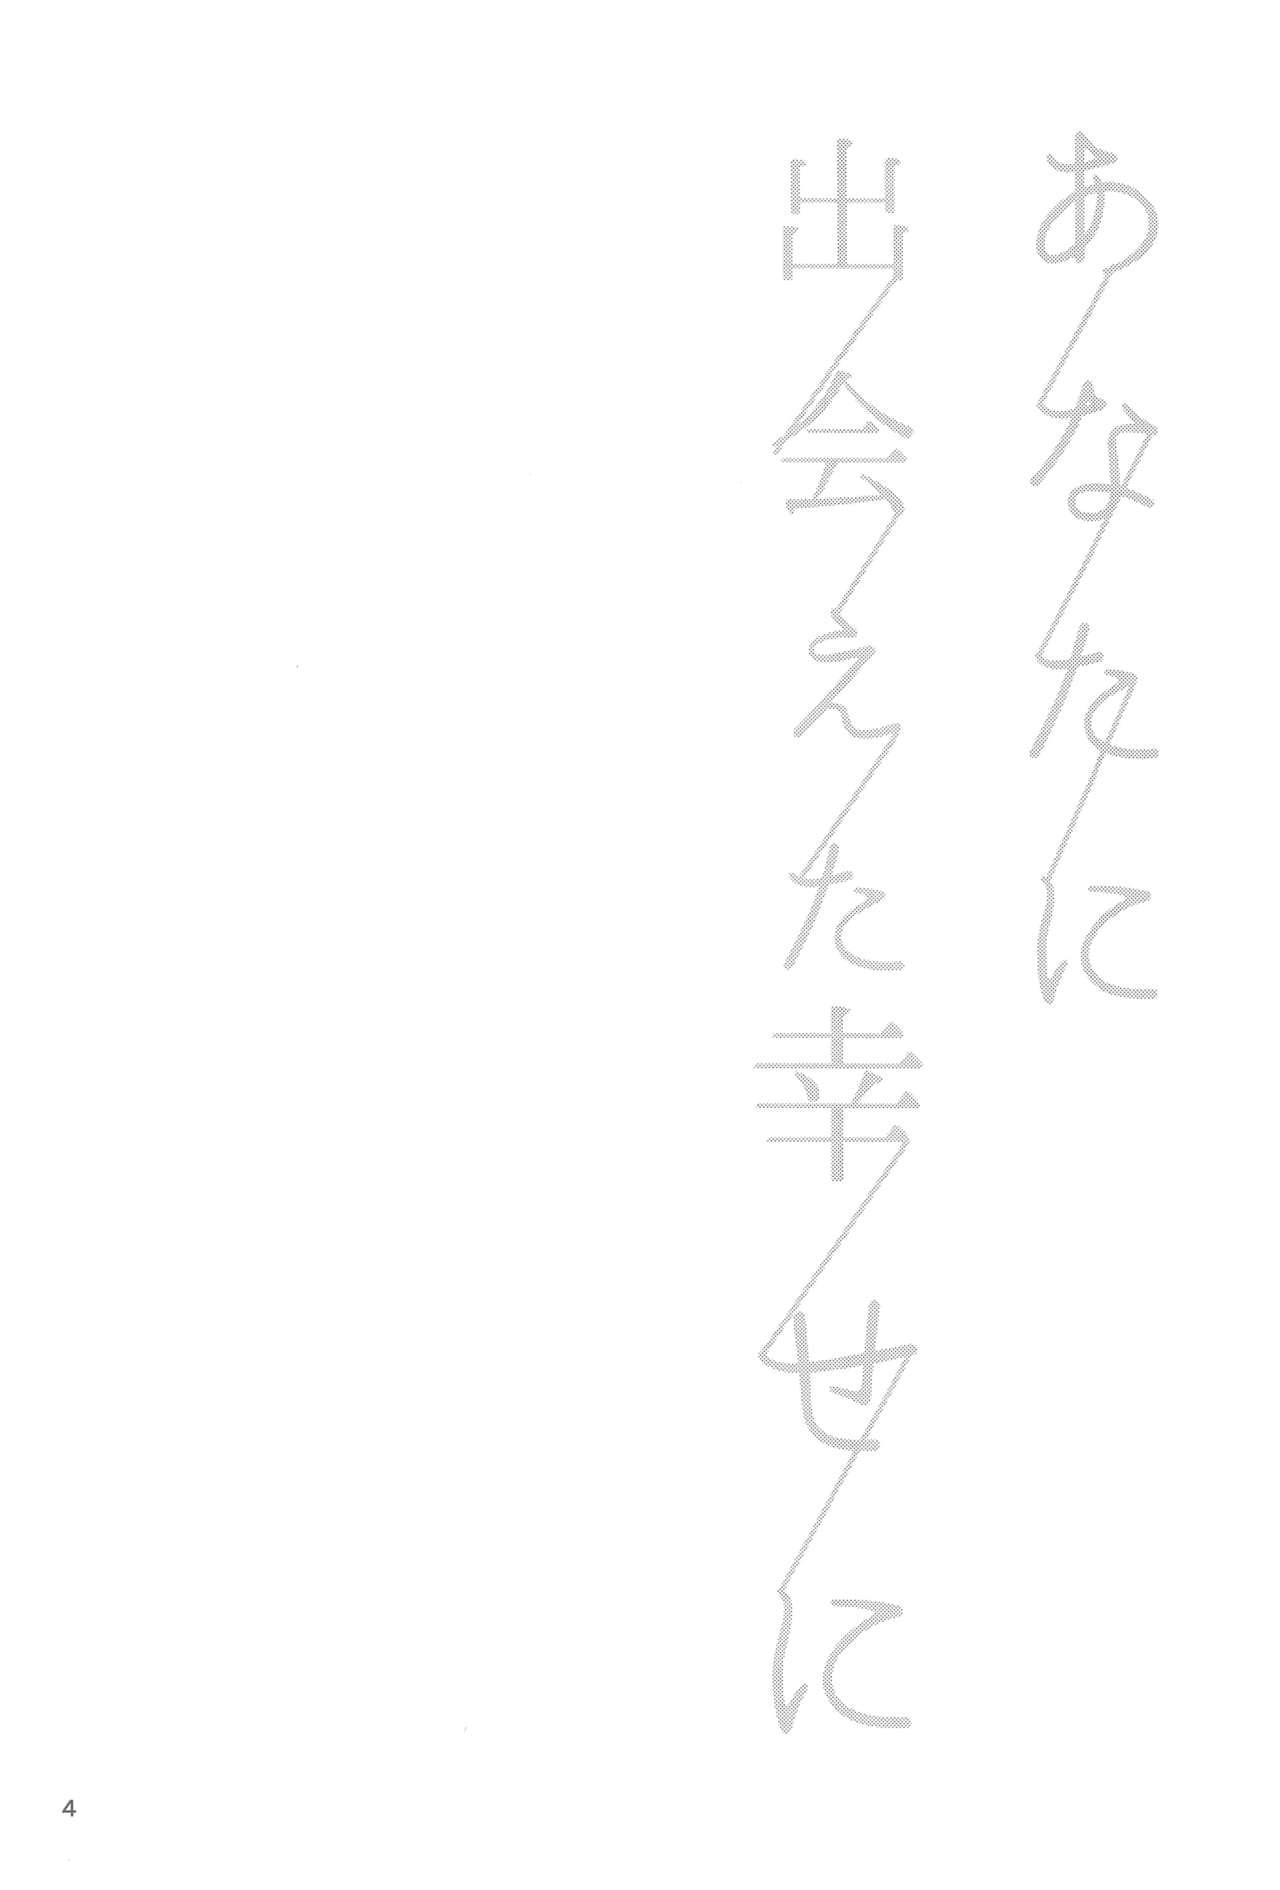 Anata ni Deaeta Shiawase ni 2